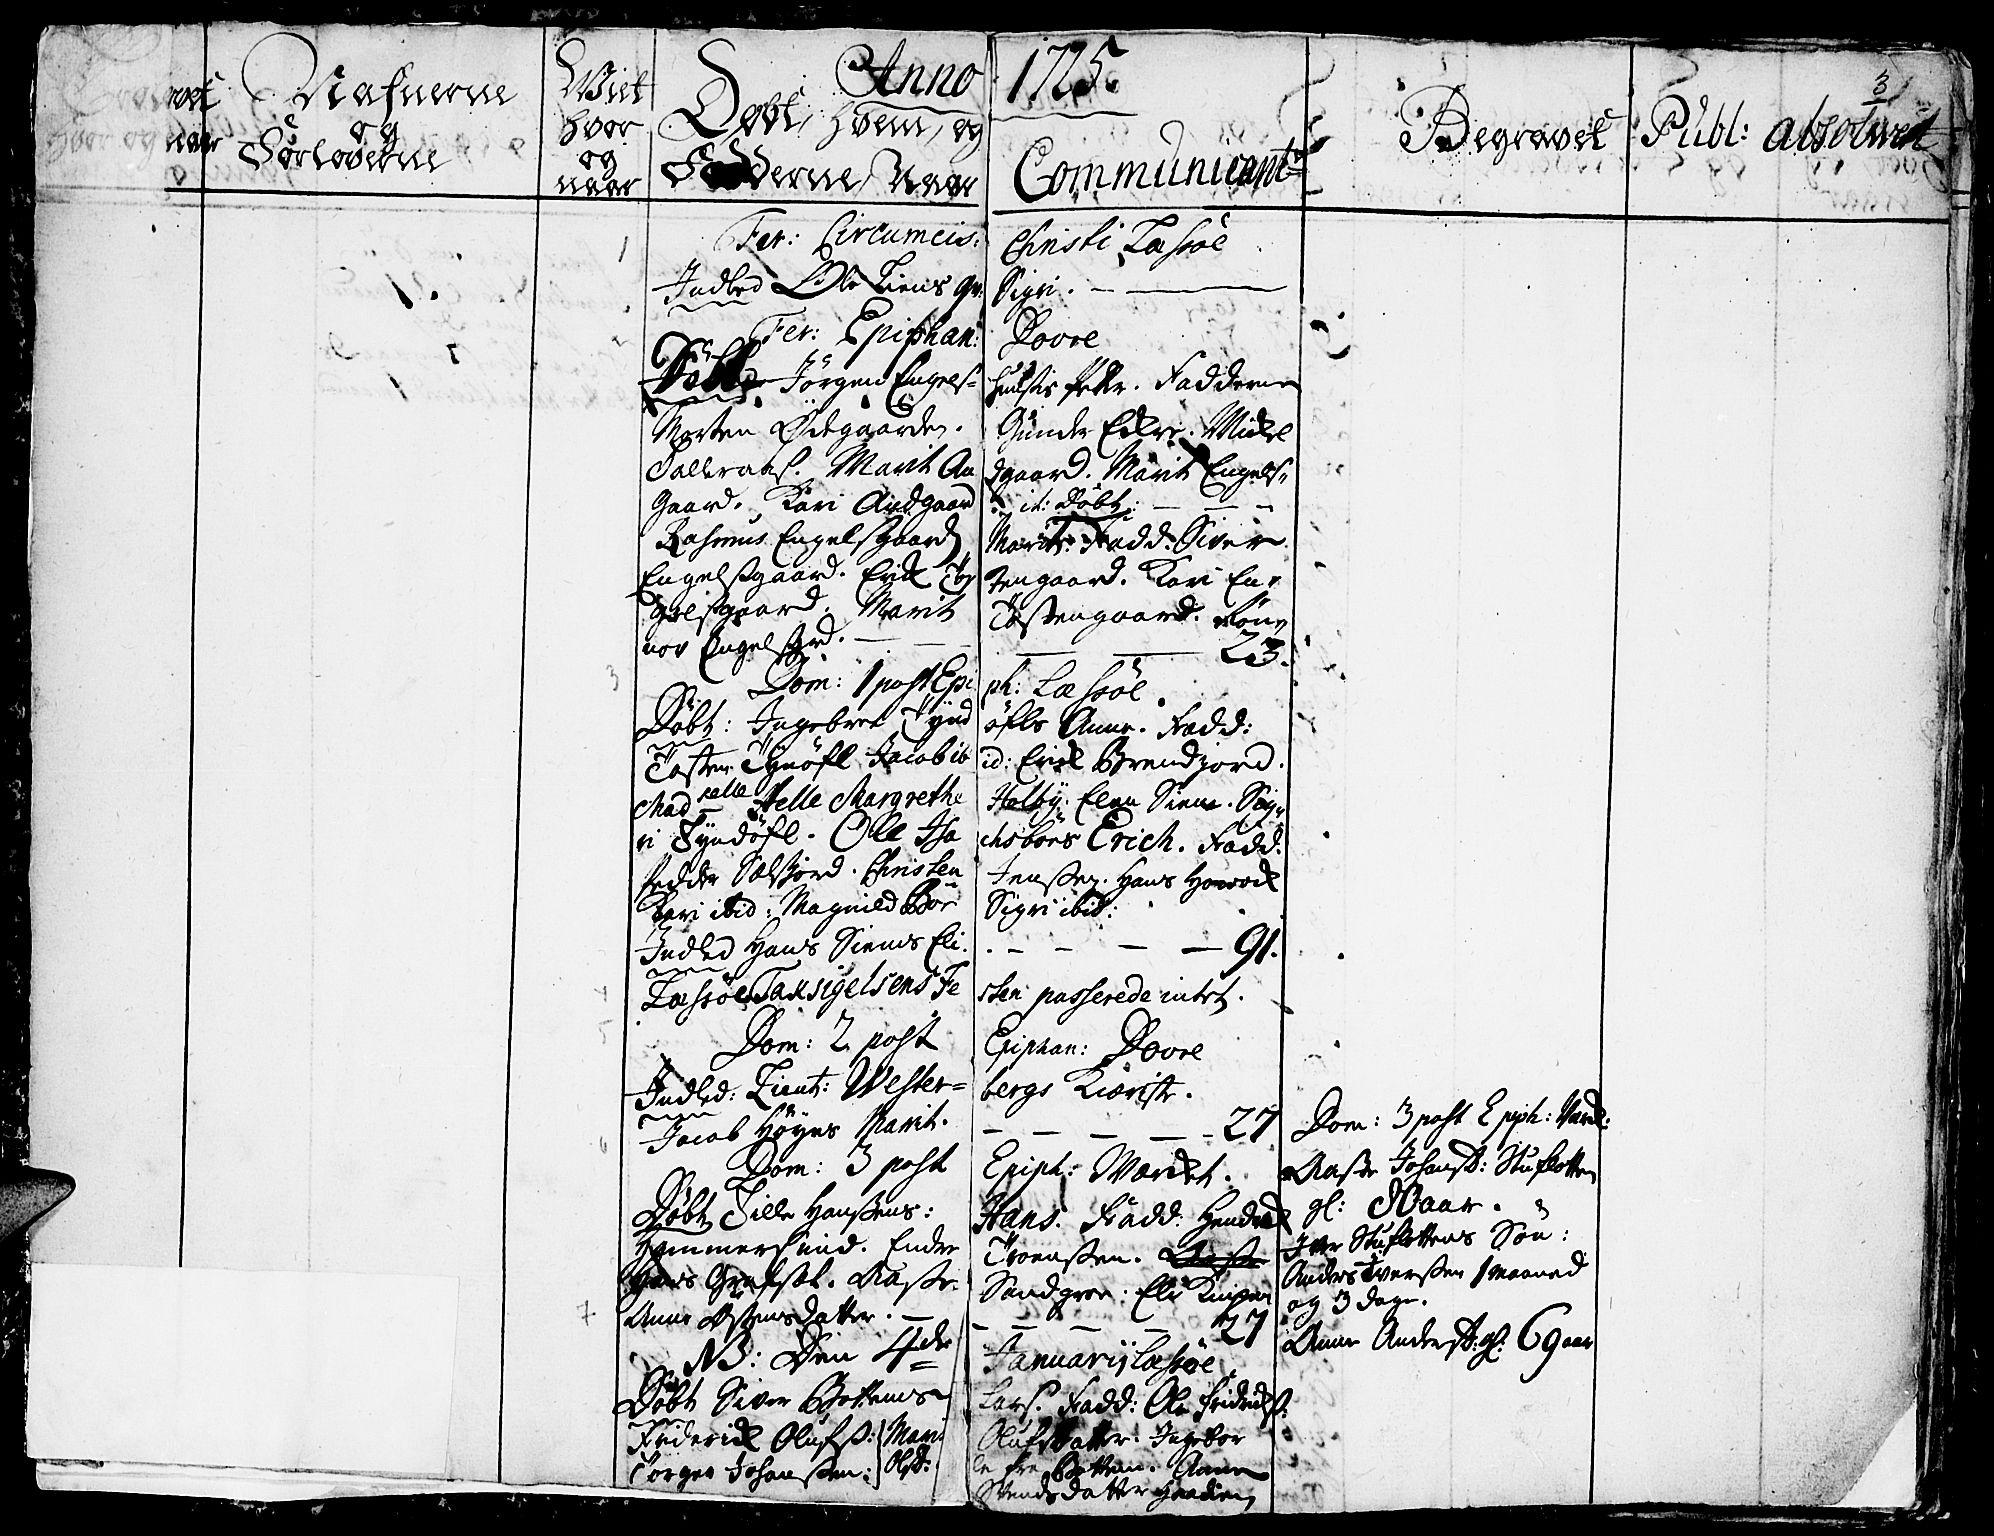 SAH, Lesja prestekontor, Ministerialbok nr. 1, 1724-1731, s. 3